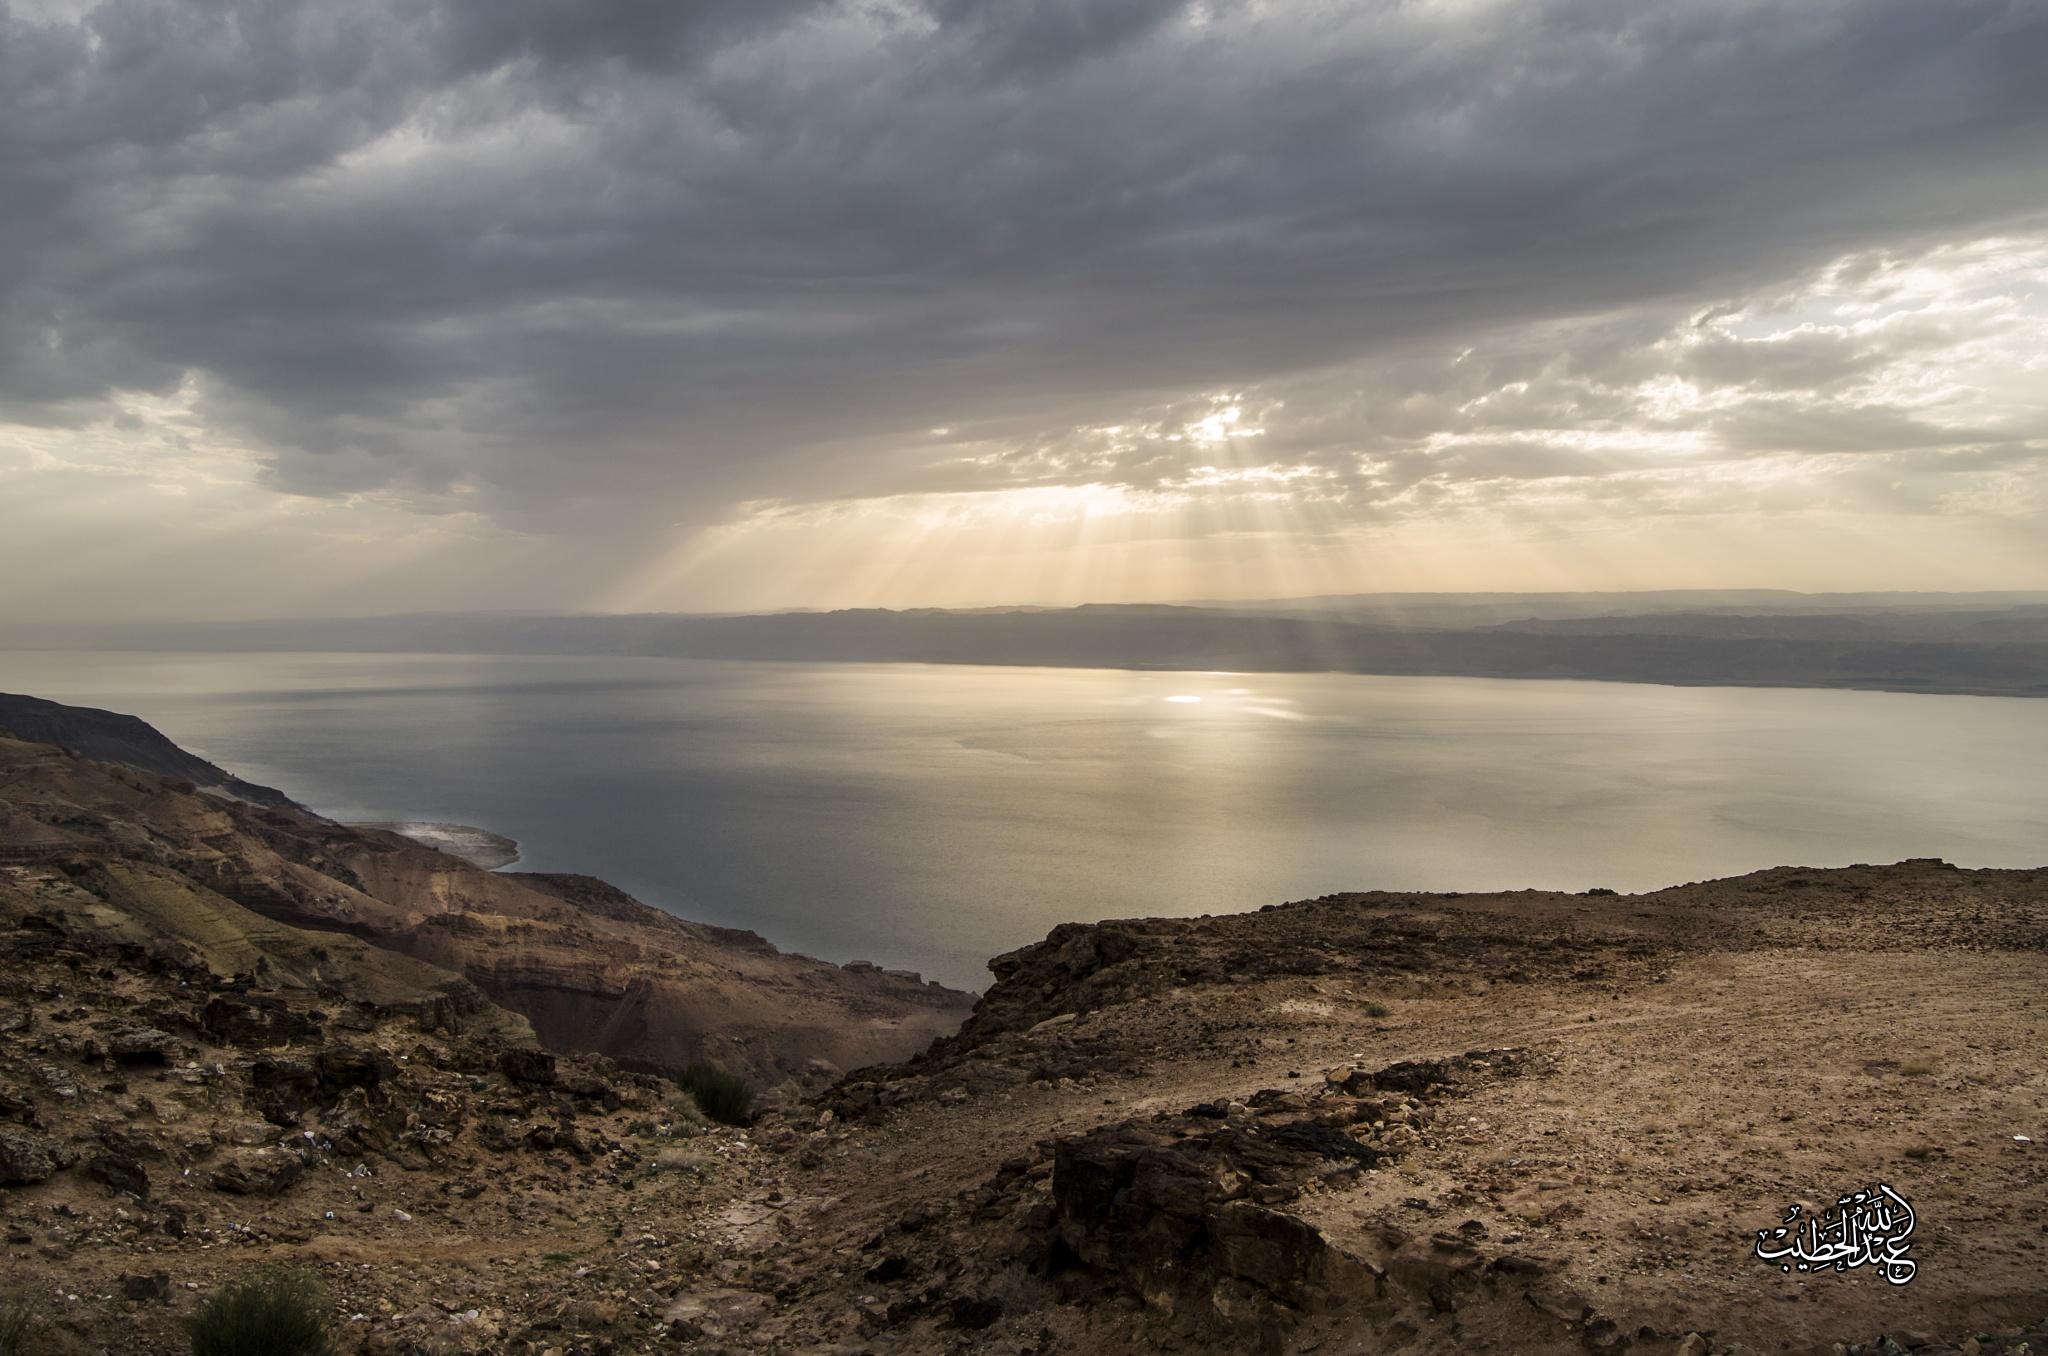 The Dead Sea by Abdallah Khateeb